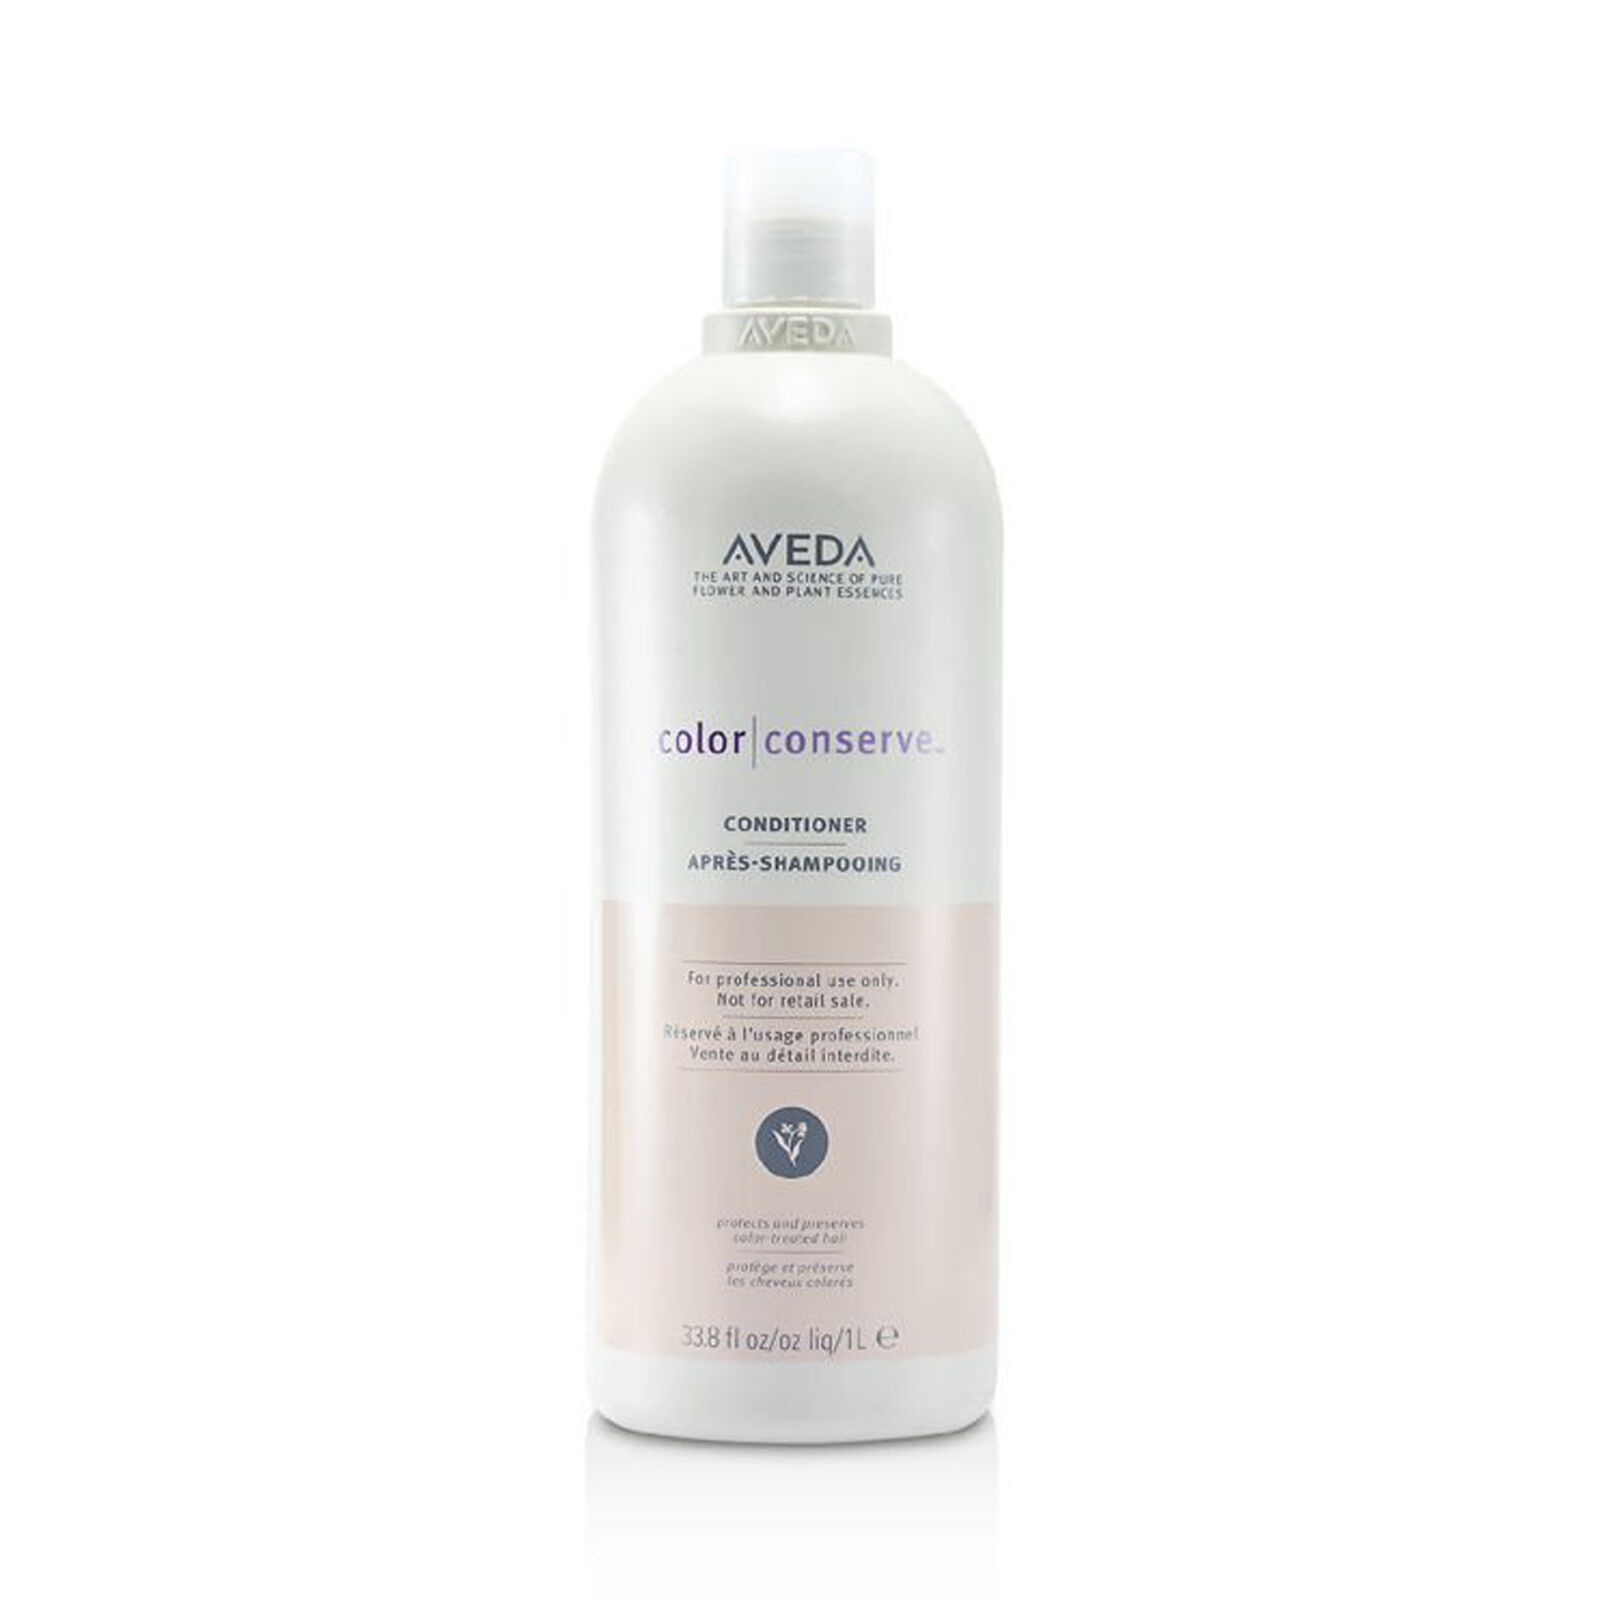 Aveda Color Conserve Conditioner 33.8 oz / 1 liter BB